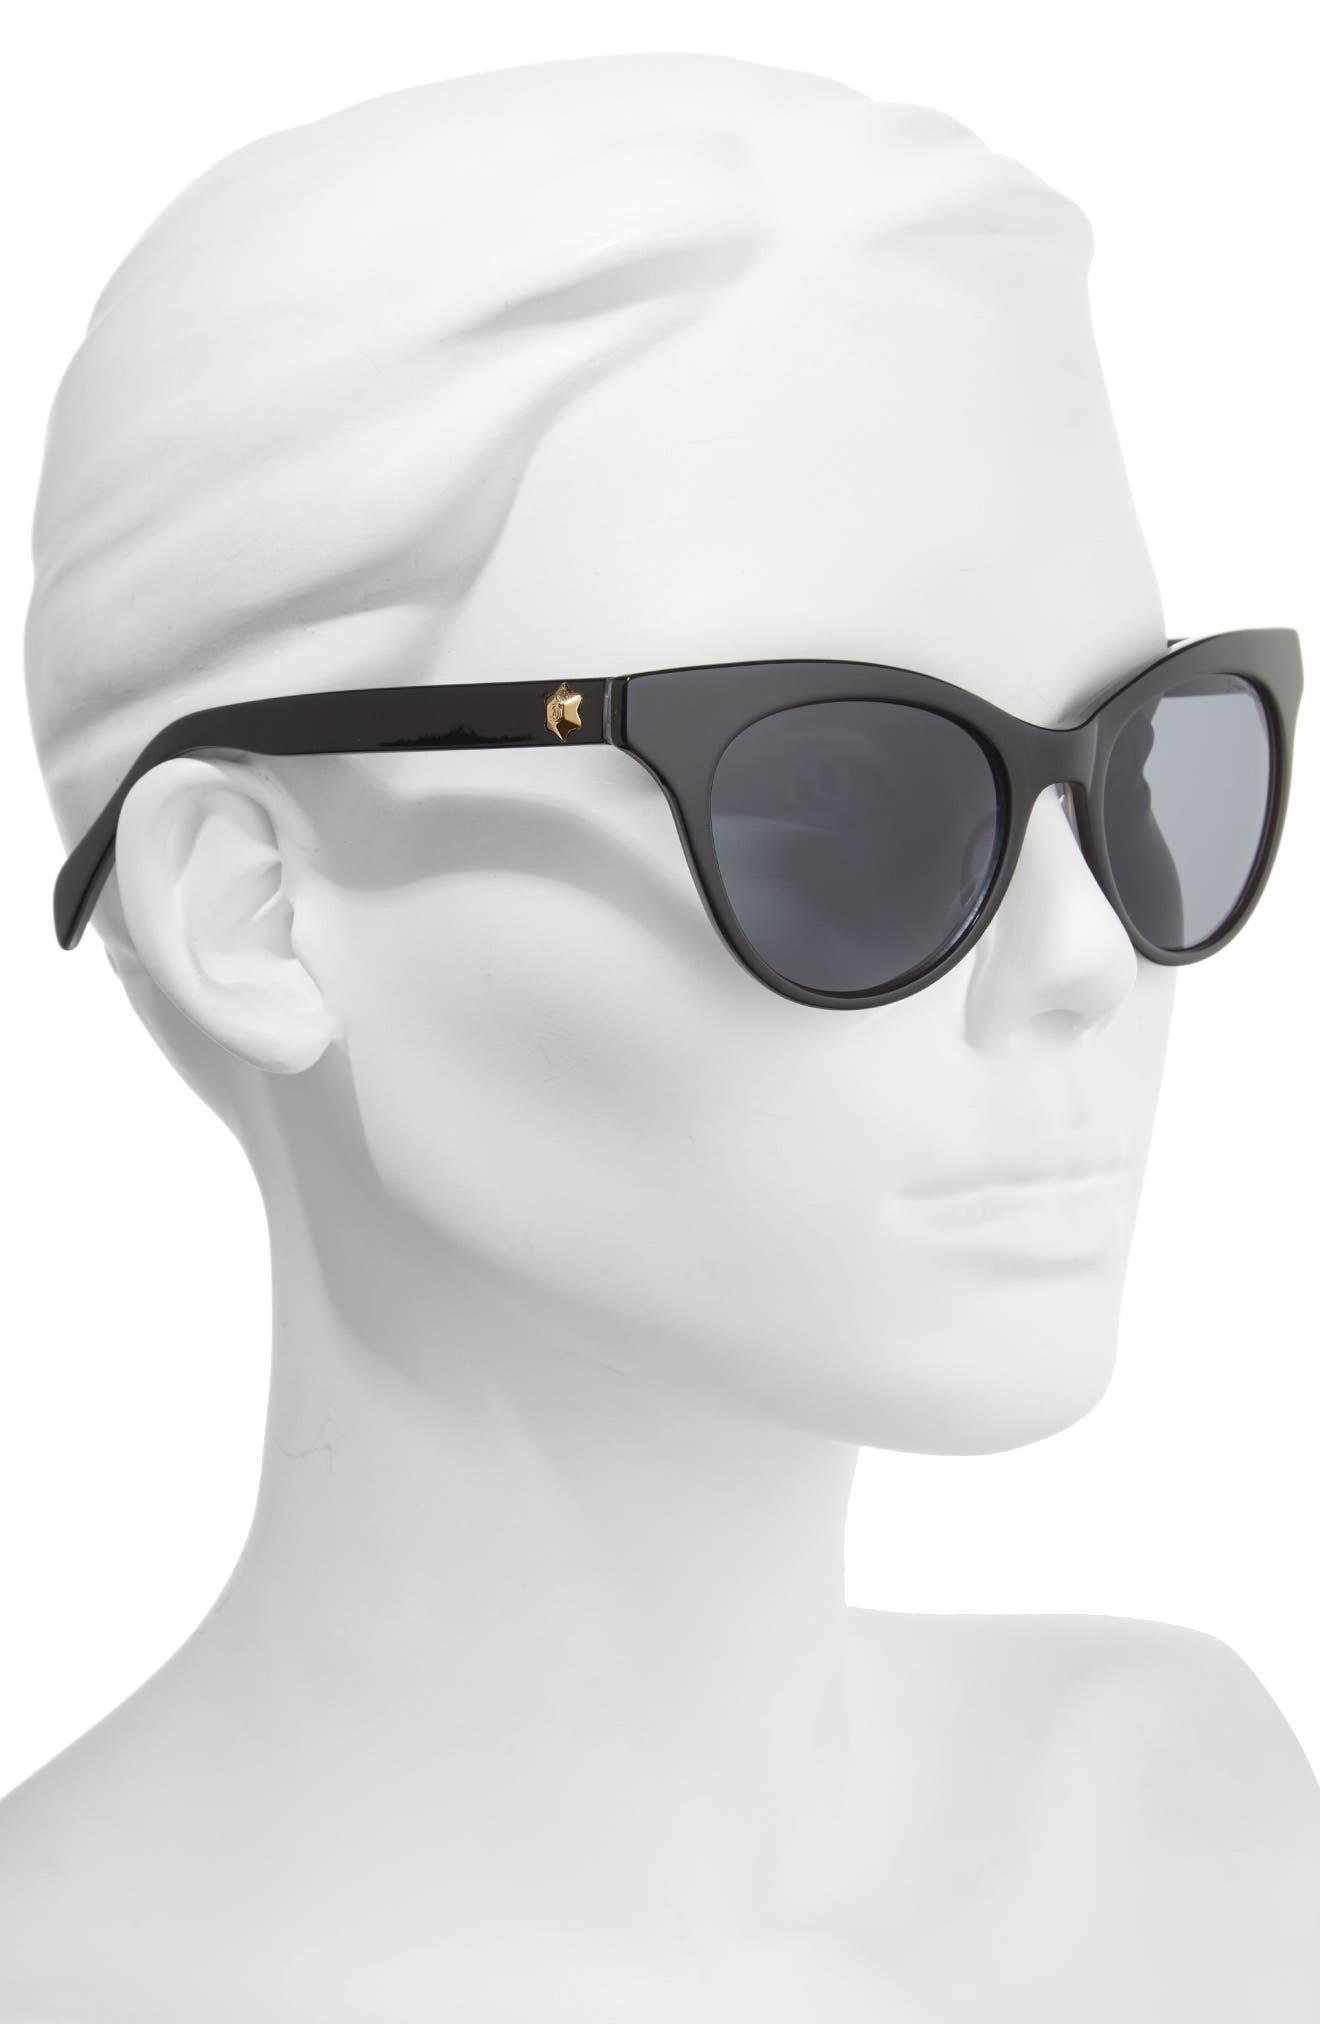 54mm Gradient Lens Cat Eye Sunglasses,                             Alternate thumbnail 2, color,                             001